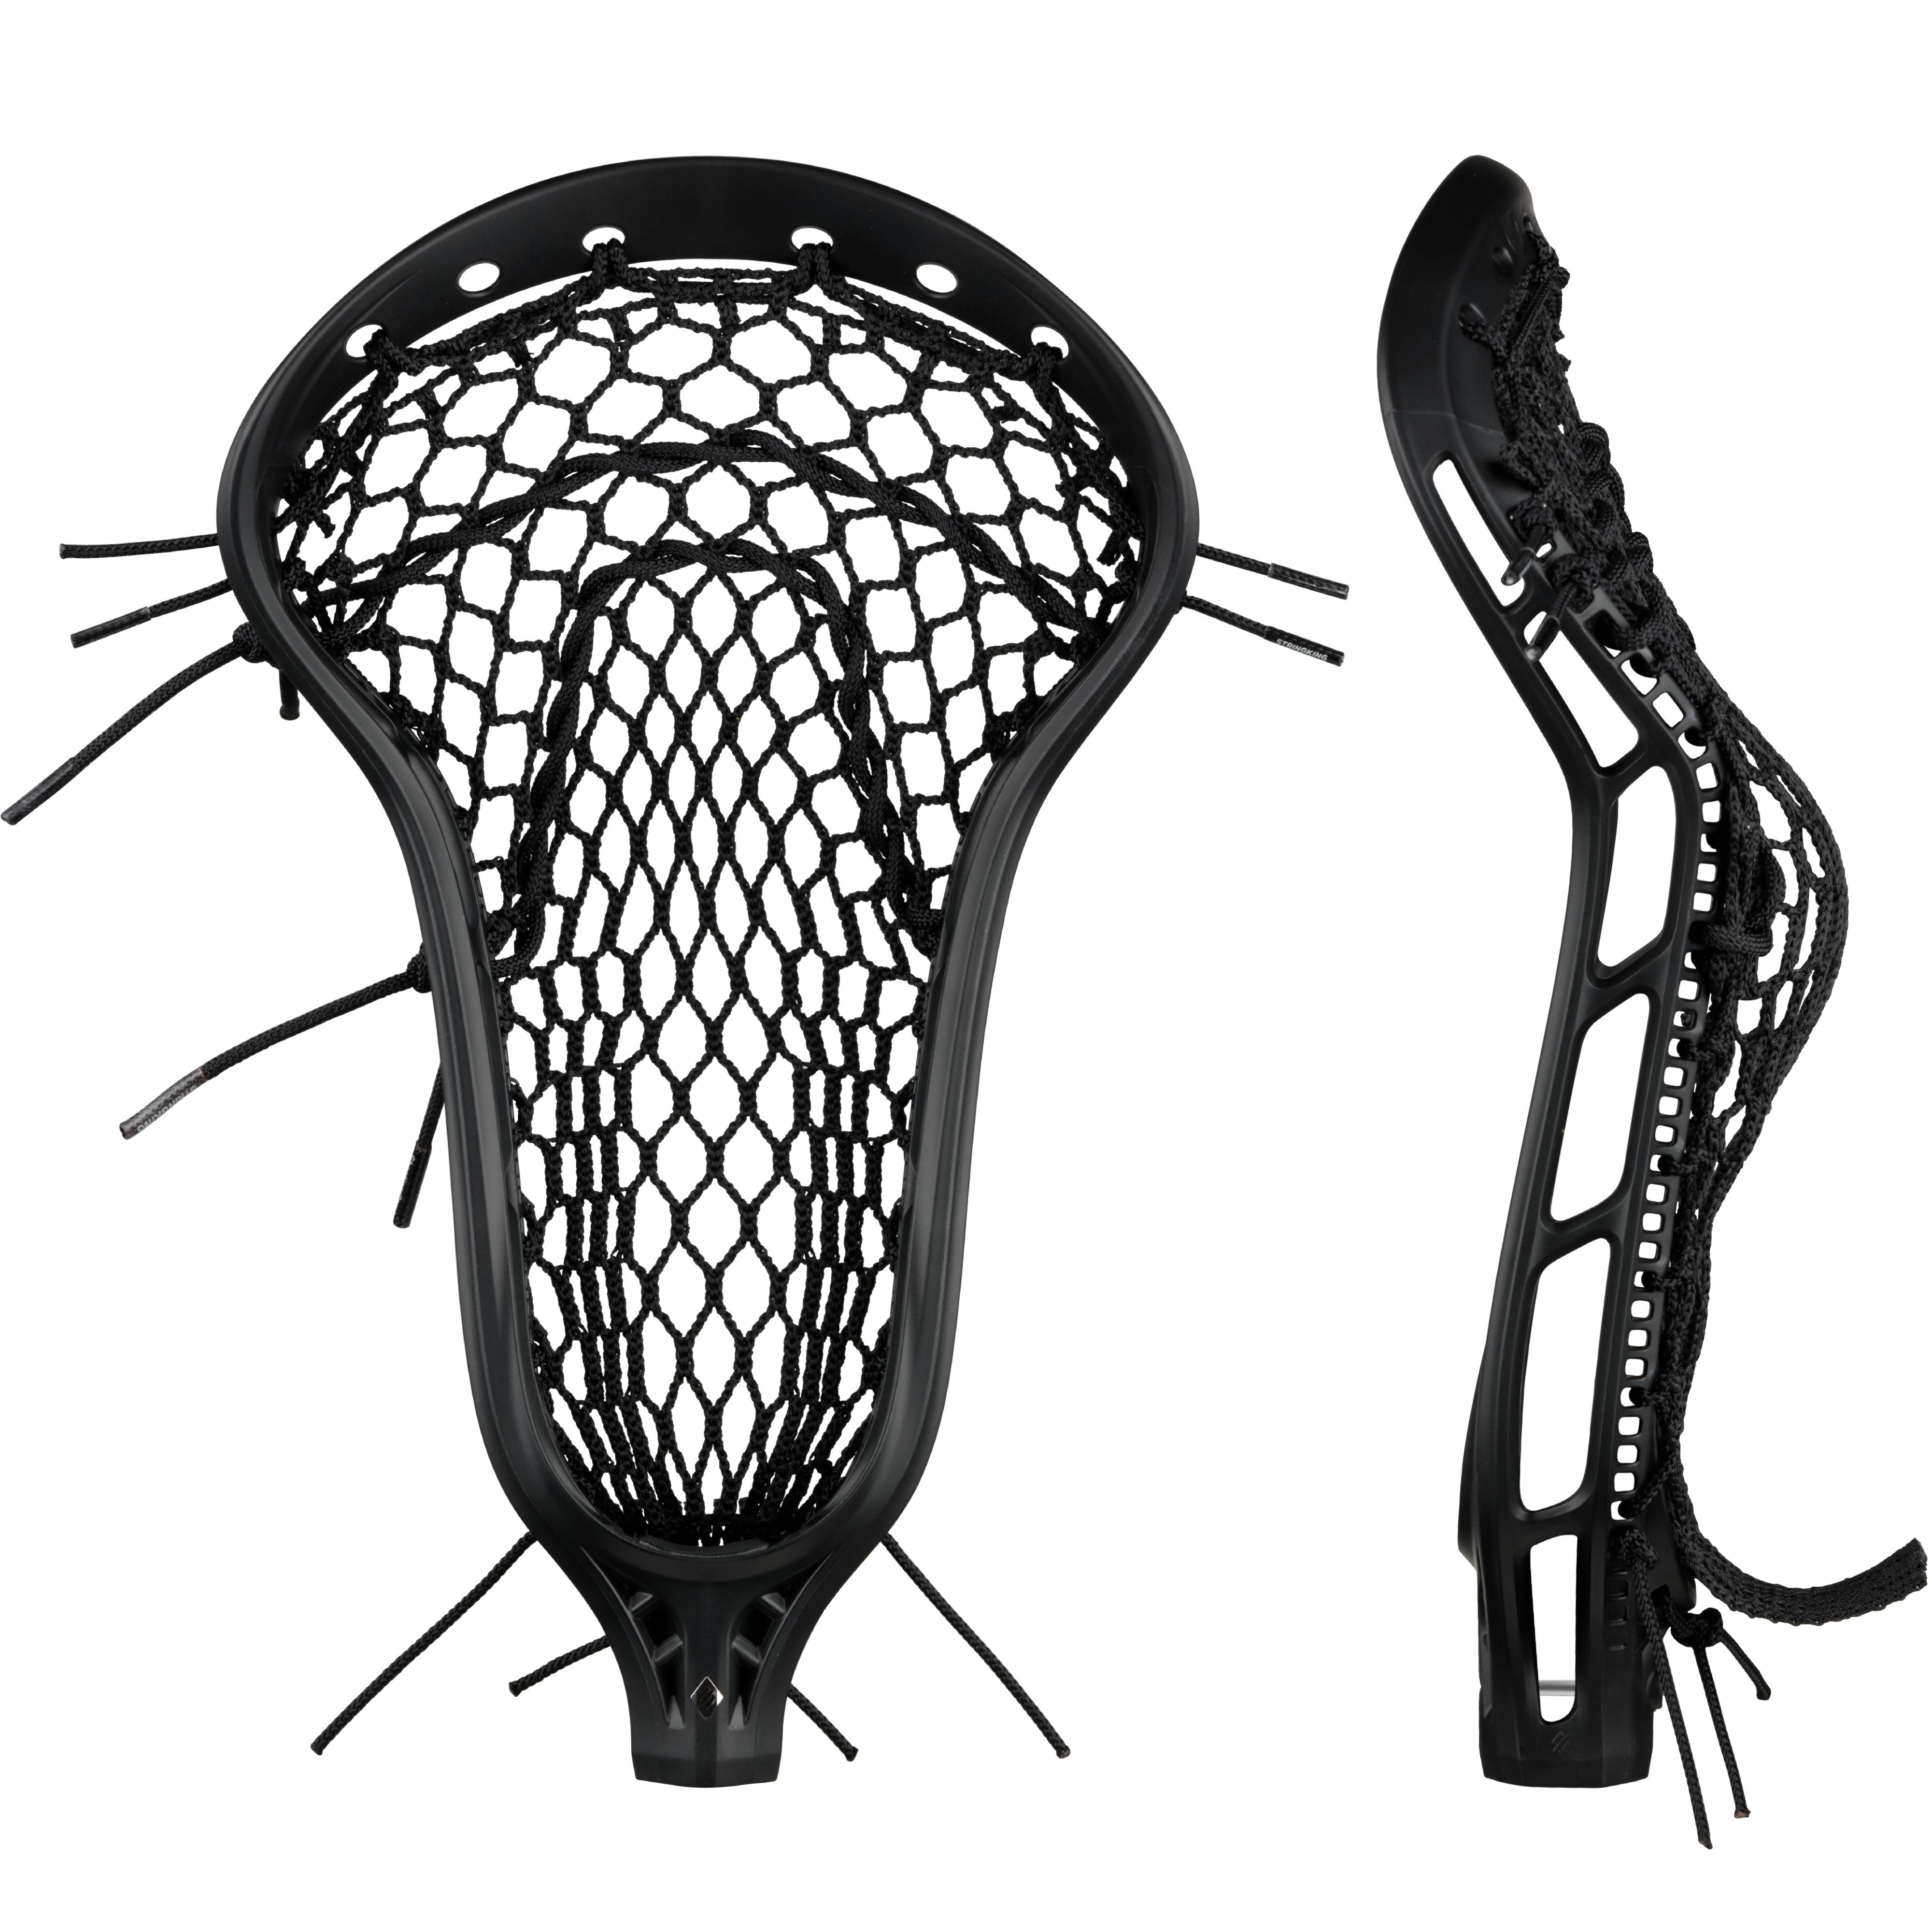 StringKing Women's Mark 2 Midfield Lacrosse Head Strung Face Pocket View Black Black